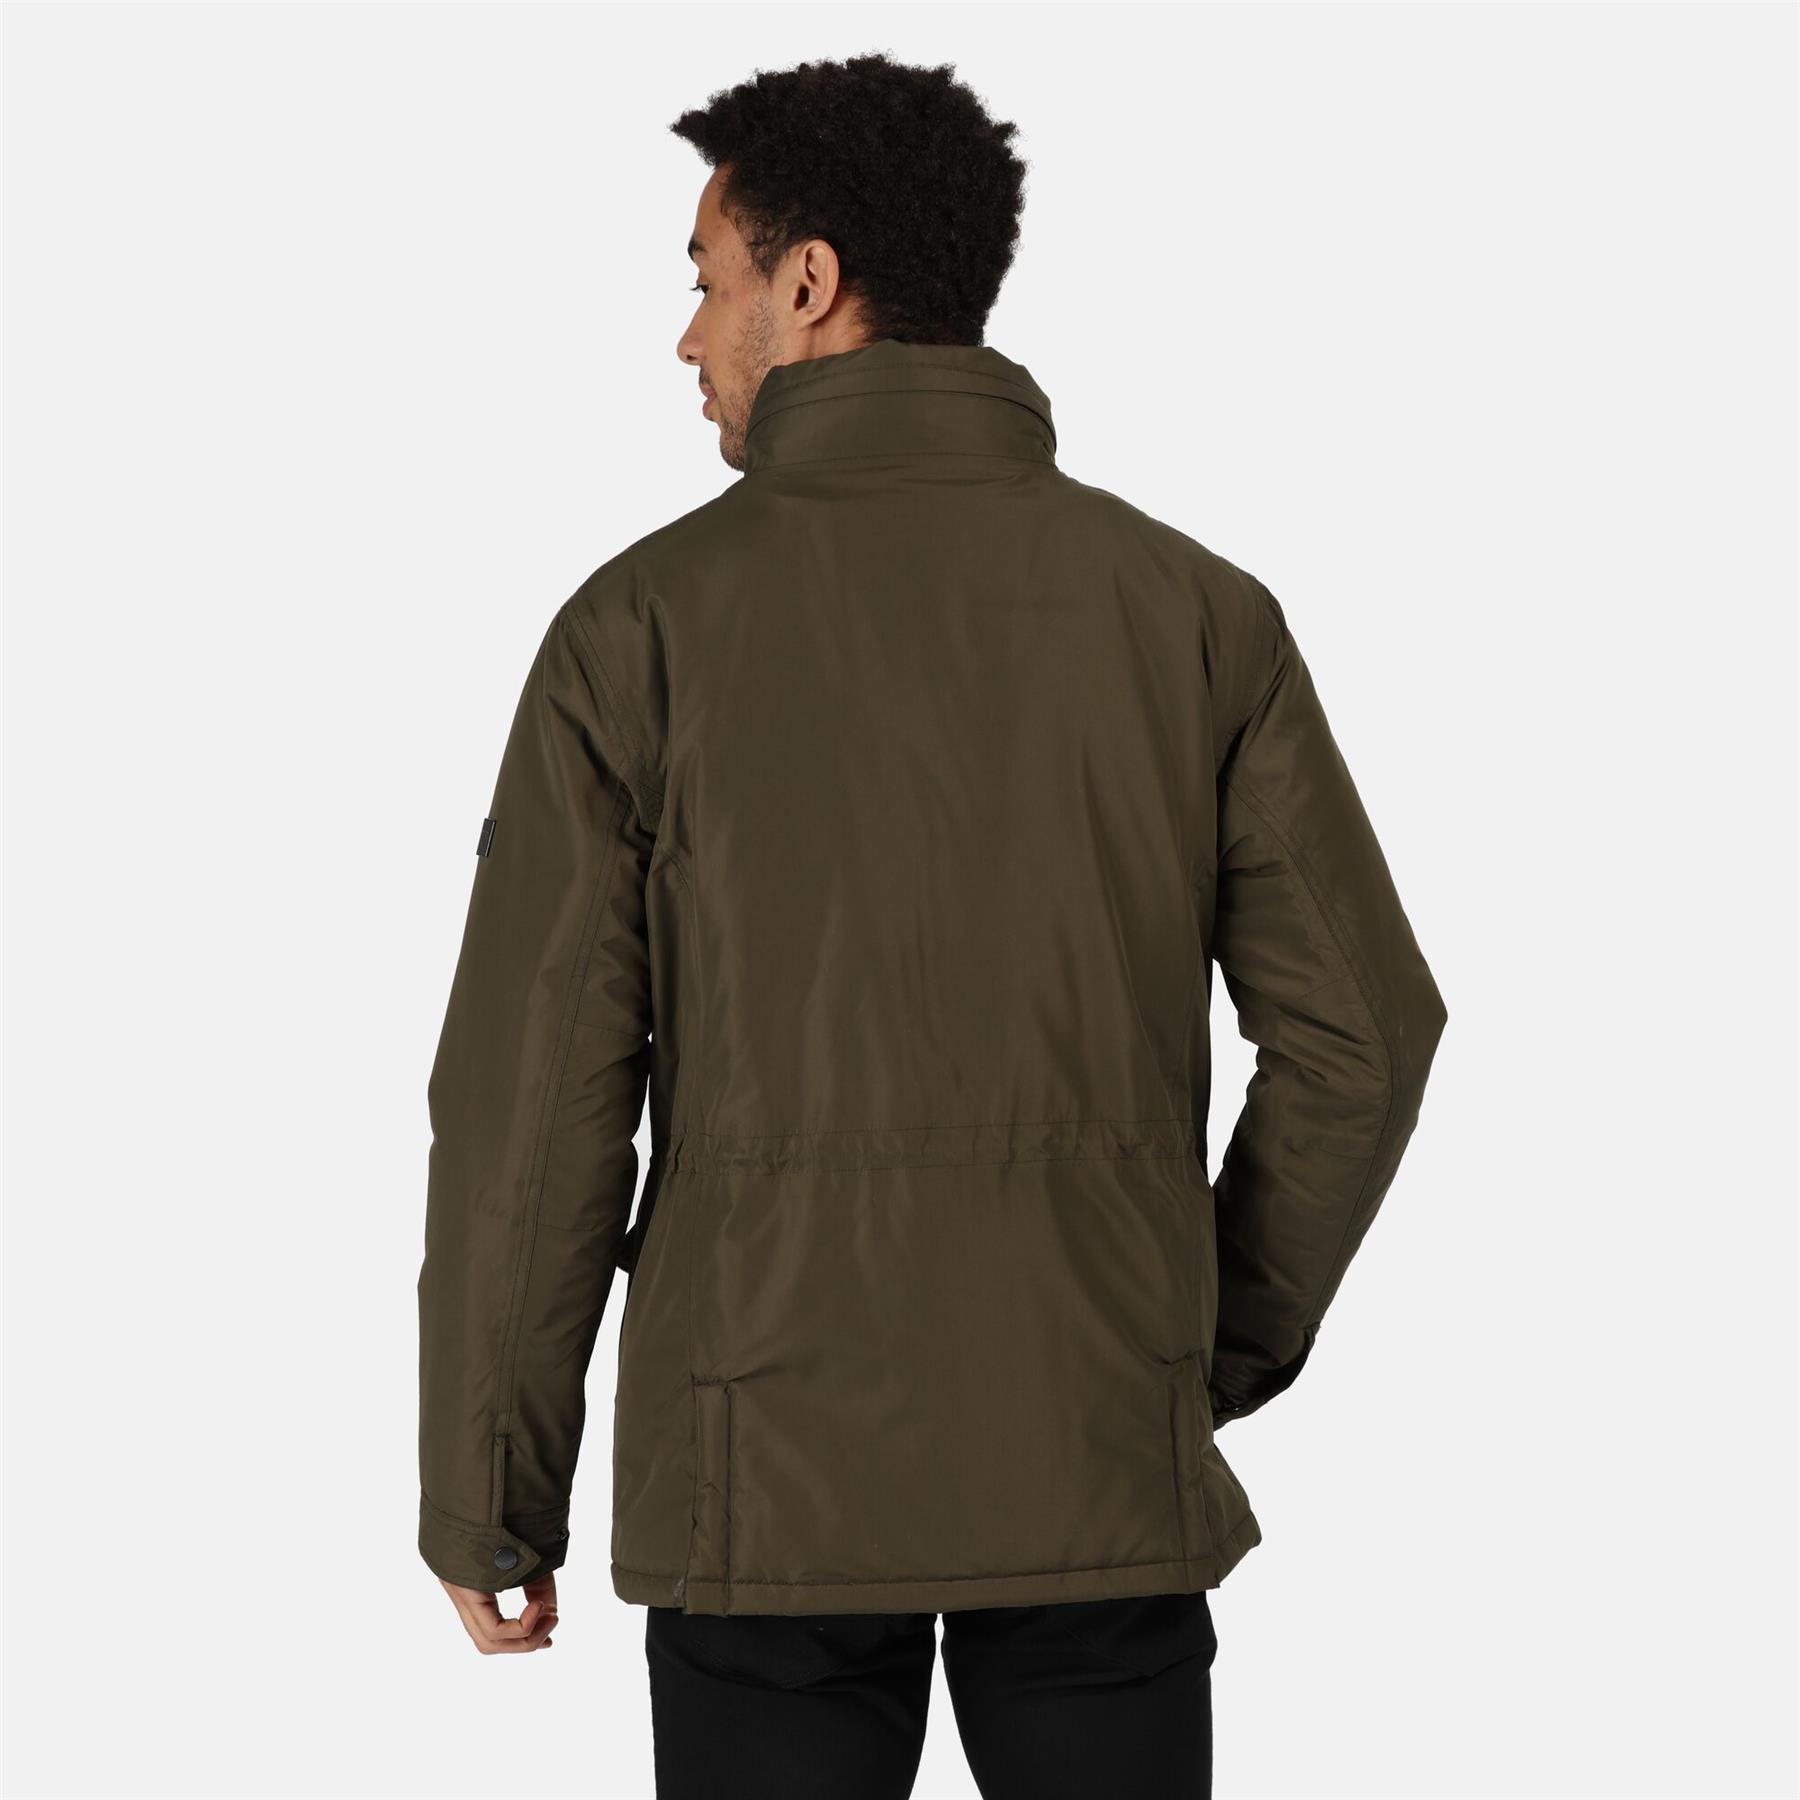 miniatuur 10 - Regatta Mens Rawson Waterproof Breathable Insulated Jacket Coat